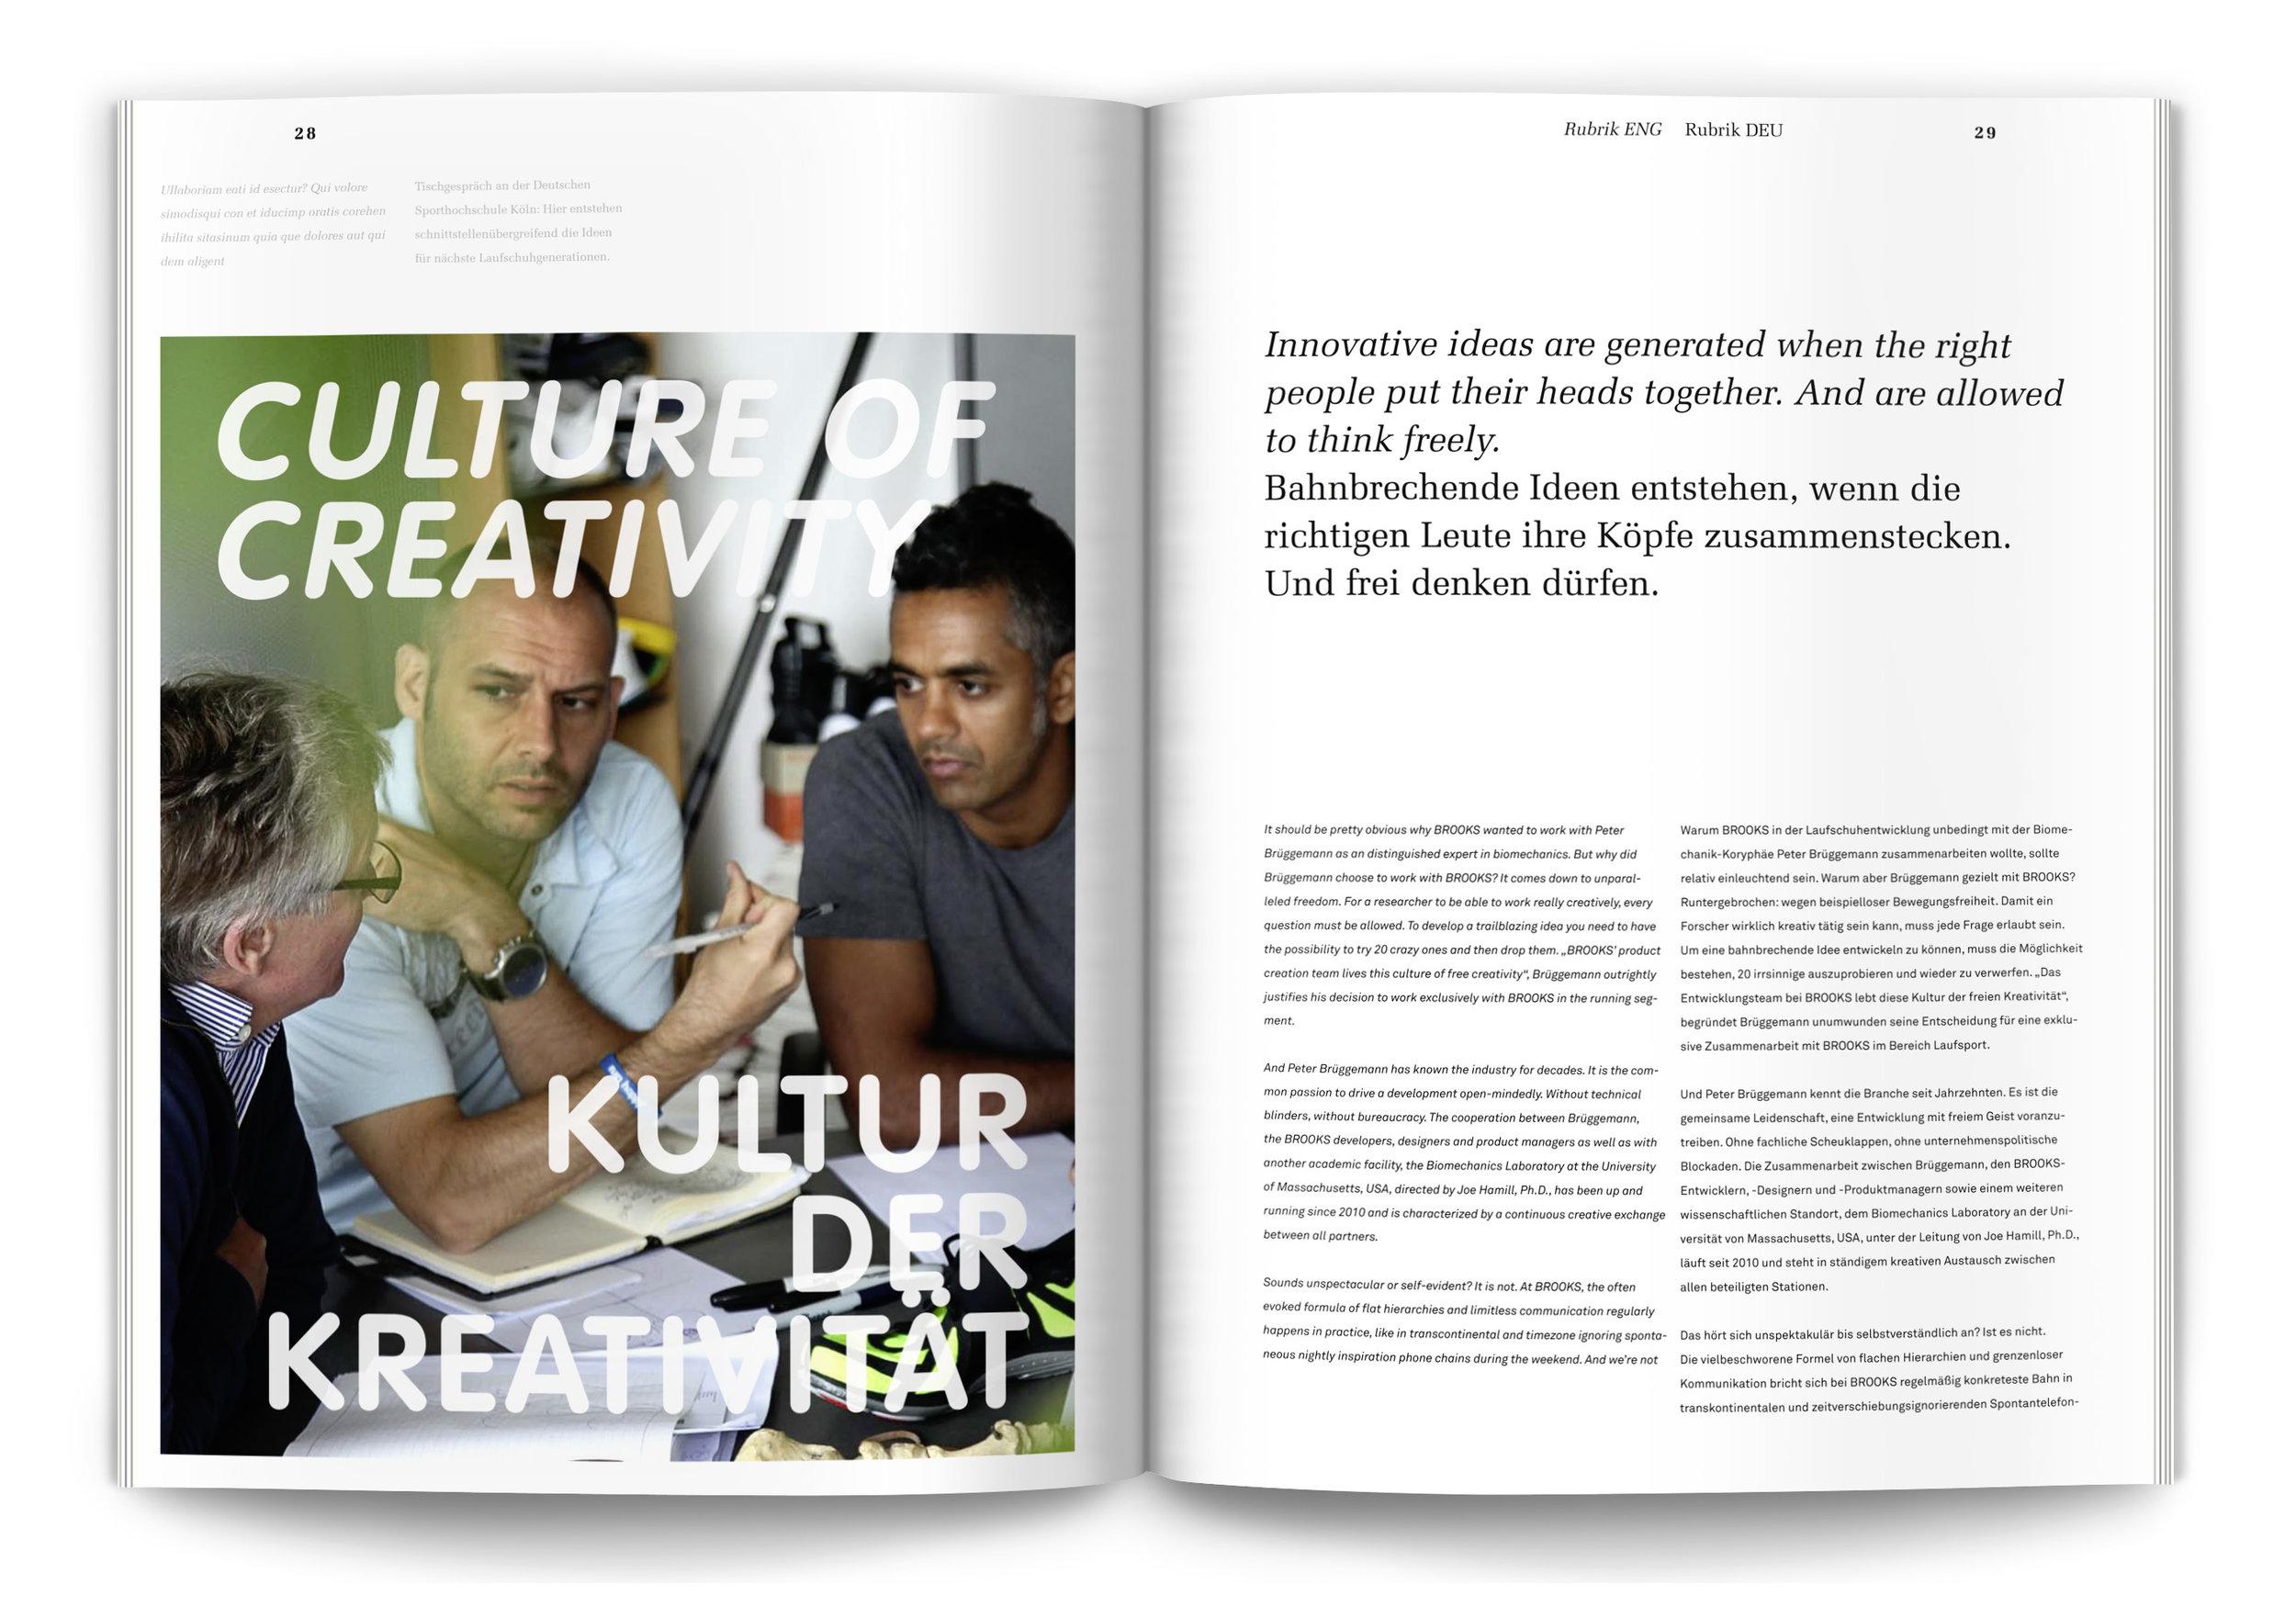 13_Josekdesign_Brooks_Book.jpg